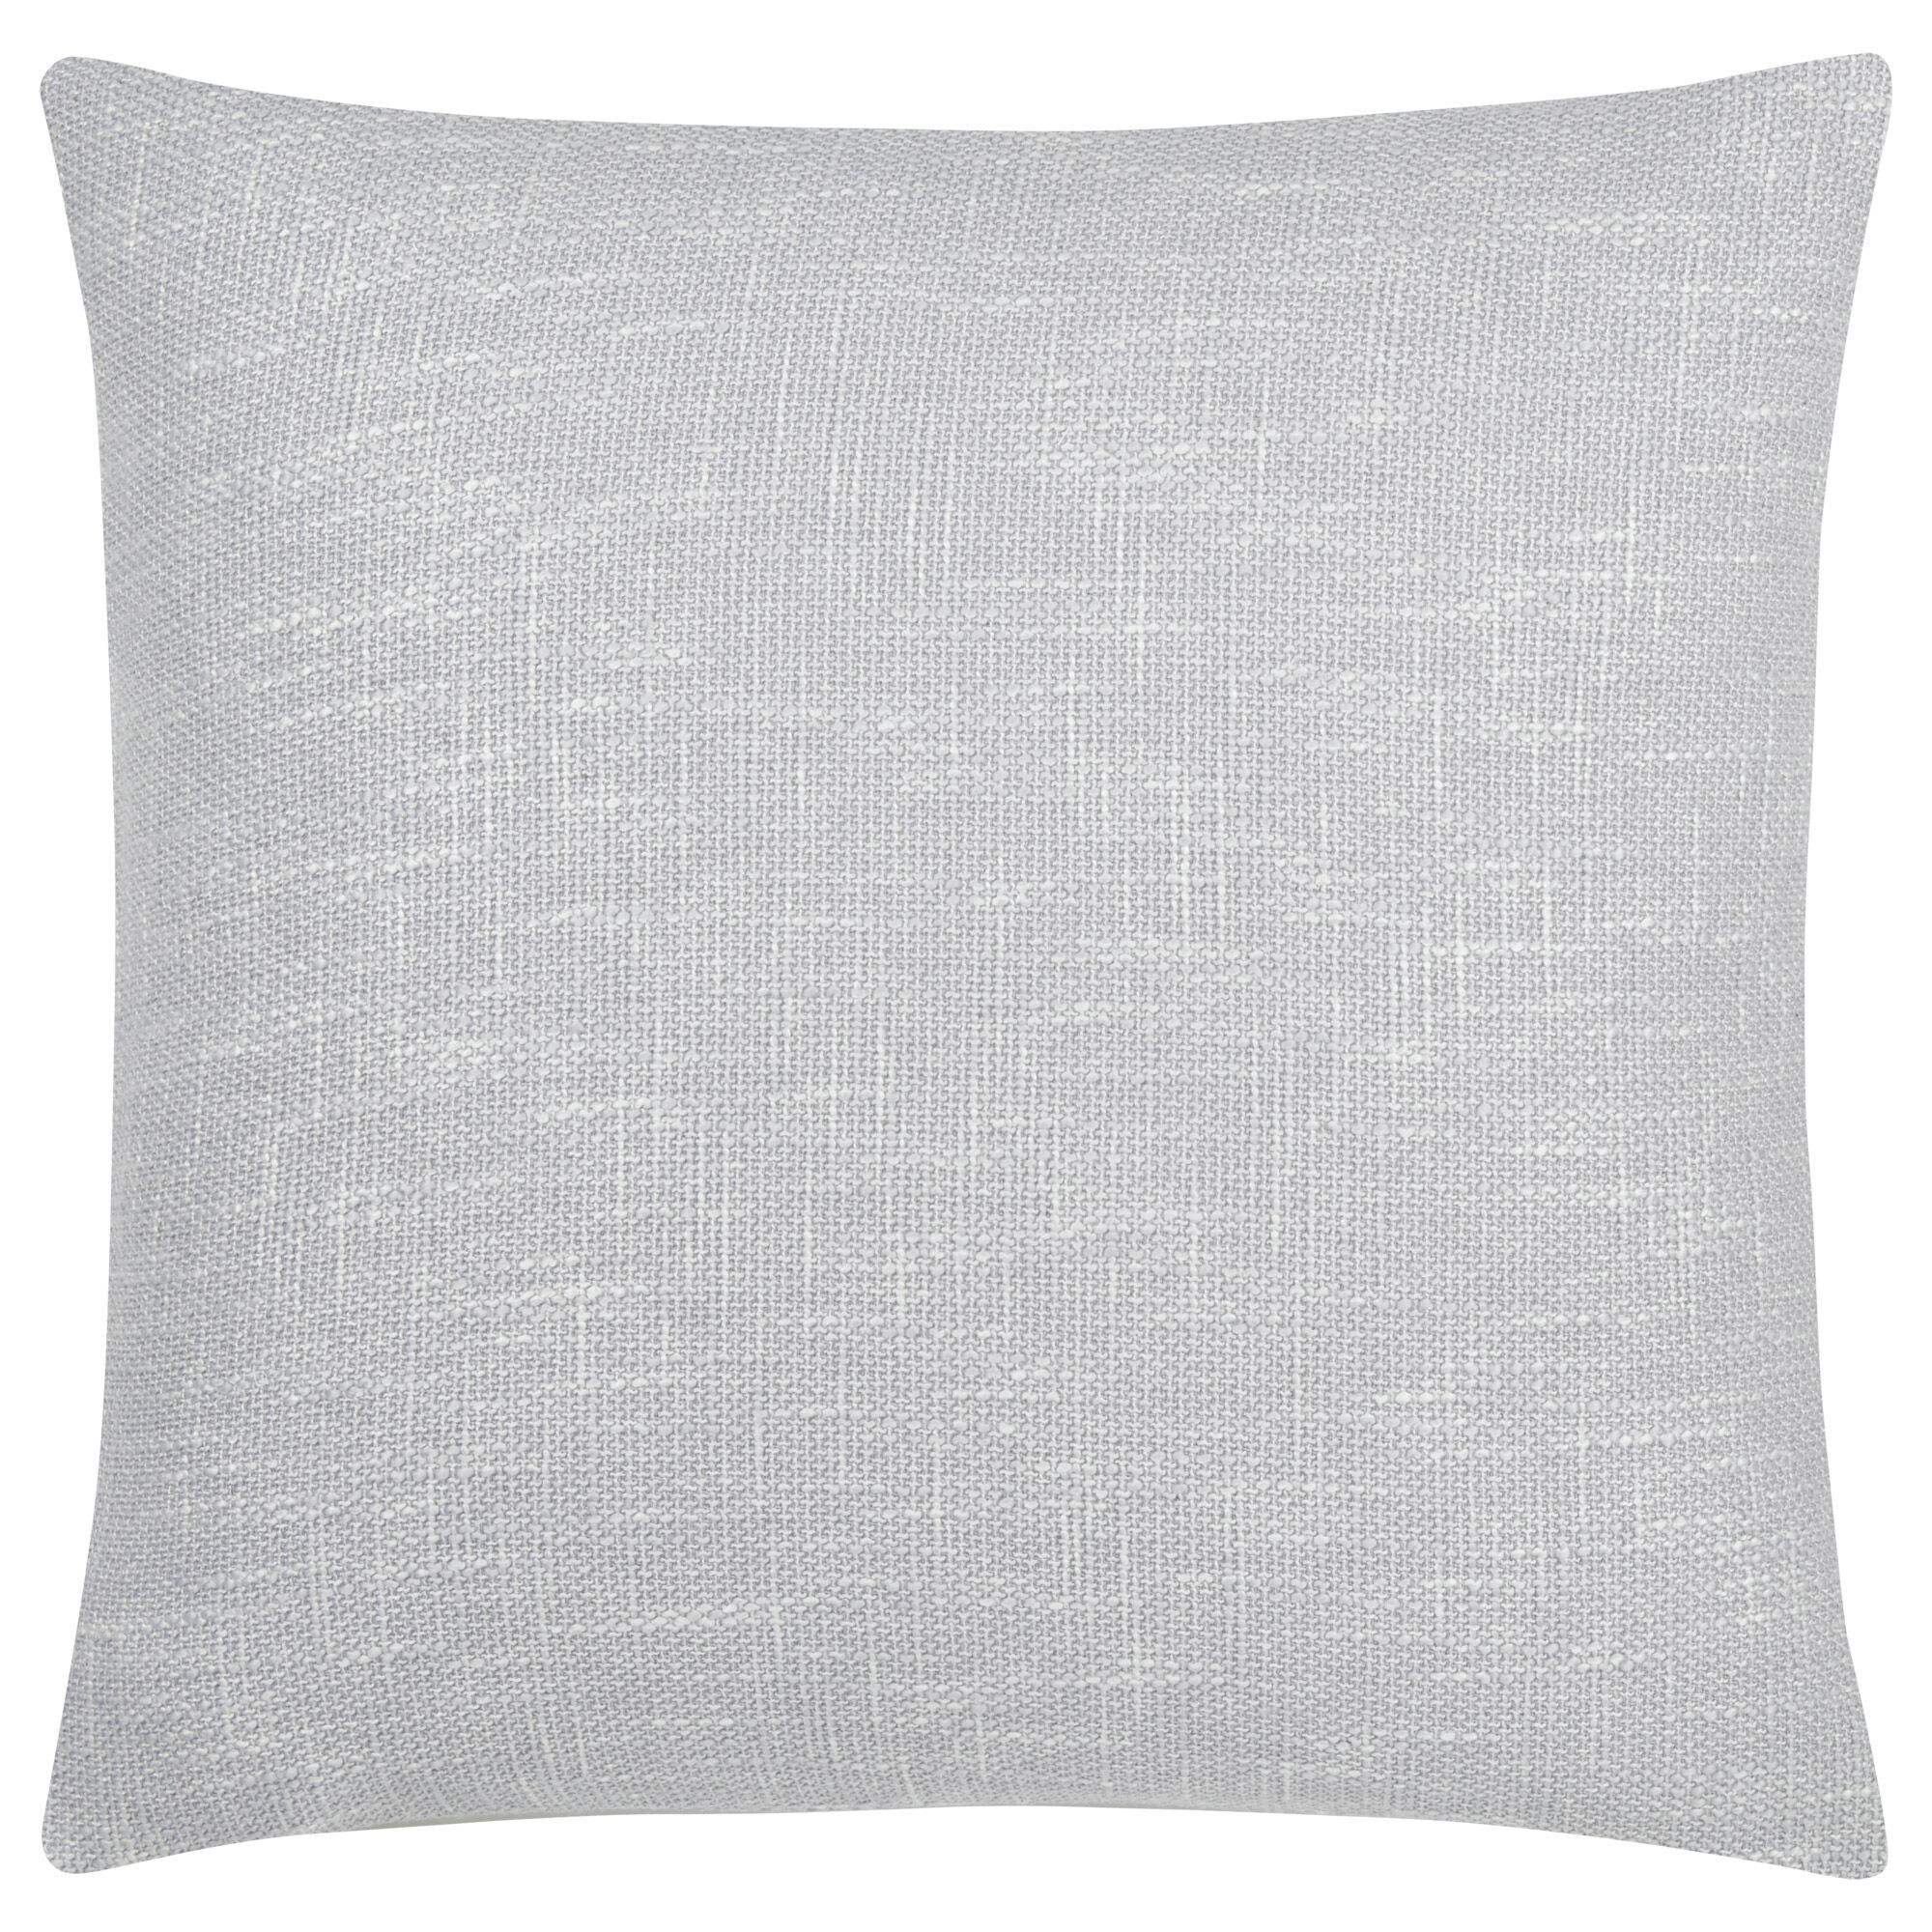 our happy place decorative pillow 19 x 19